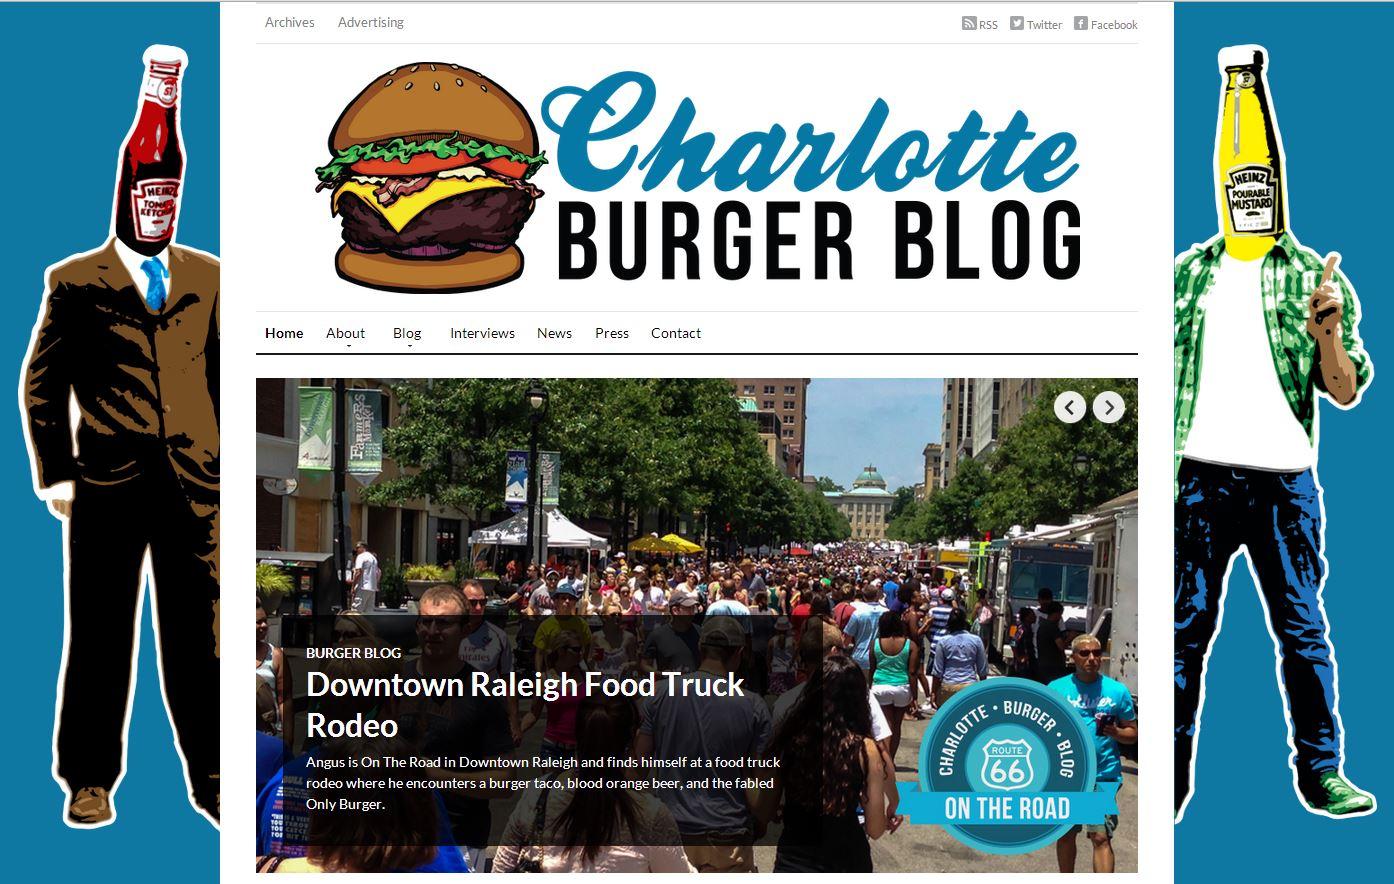 burger_conquest_best_burger_blogs_bloggers_food_2014_charlotte_burger_blog